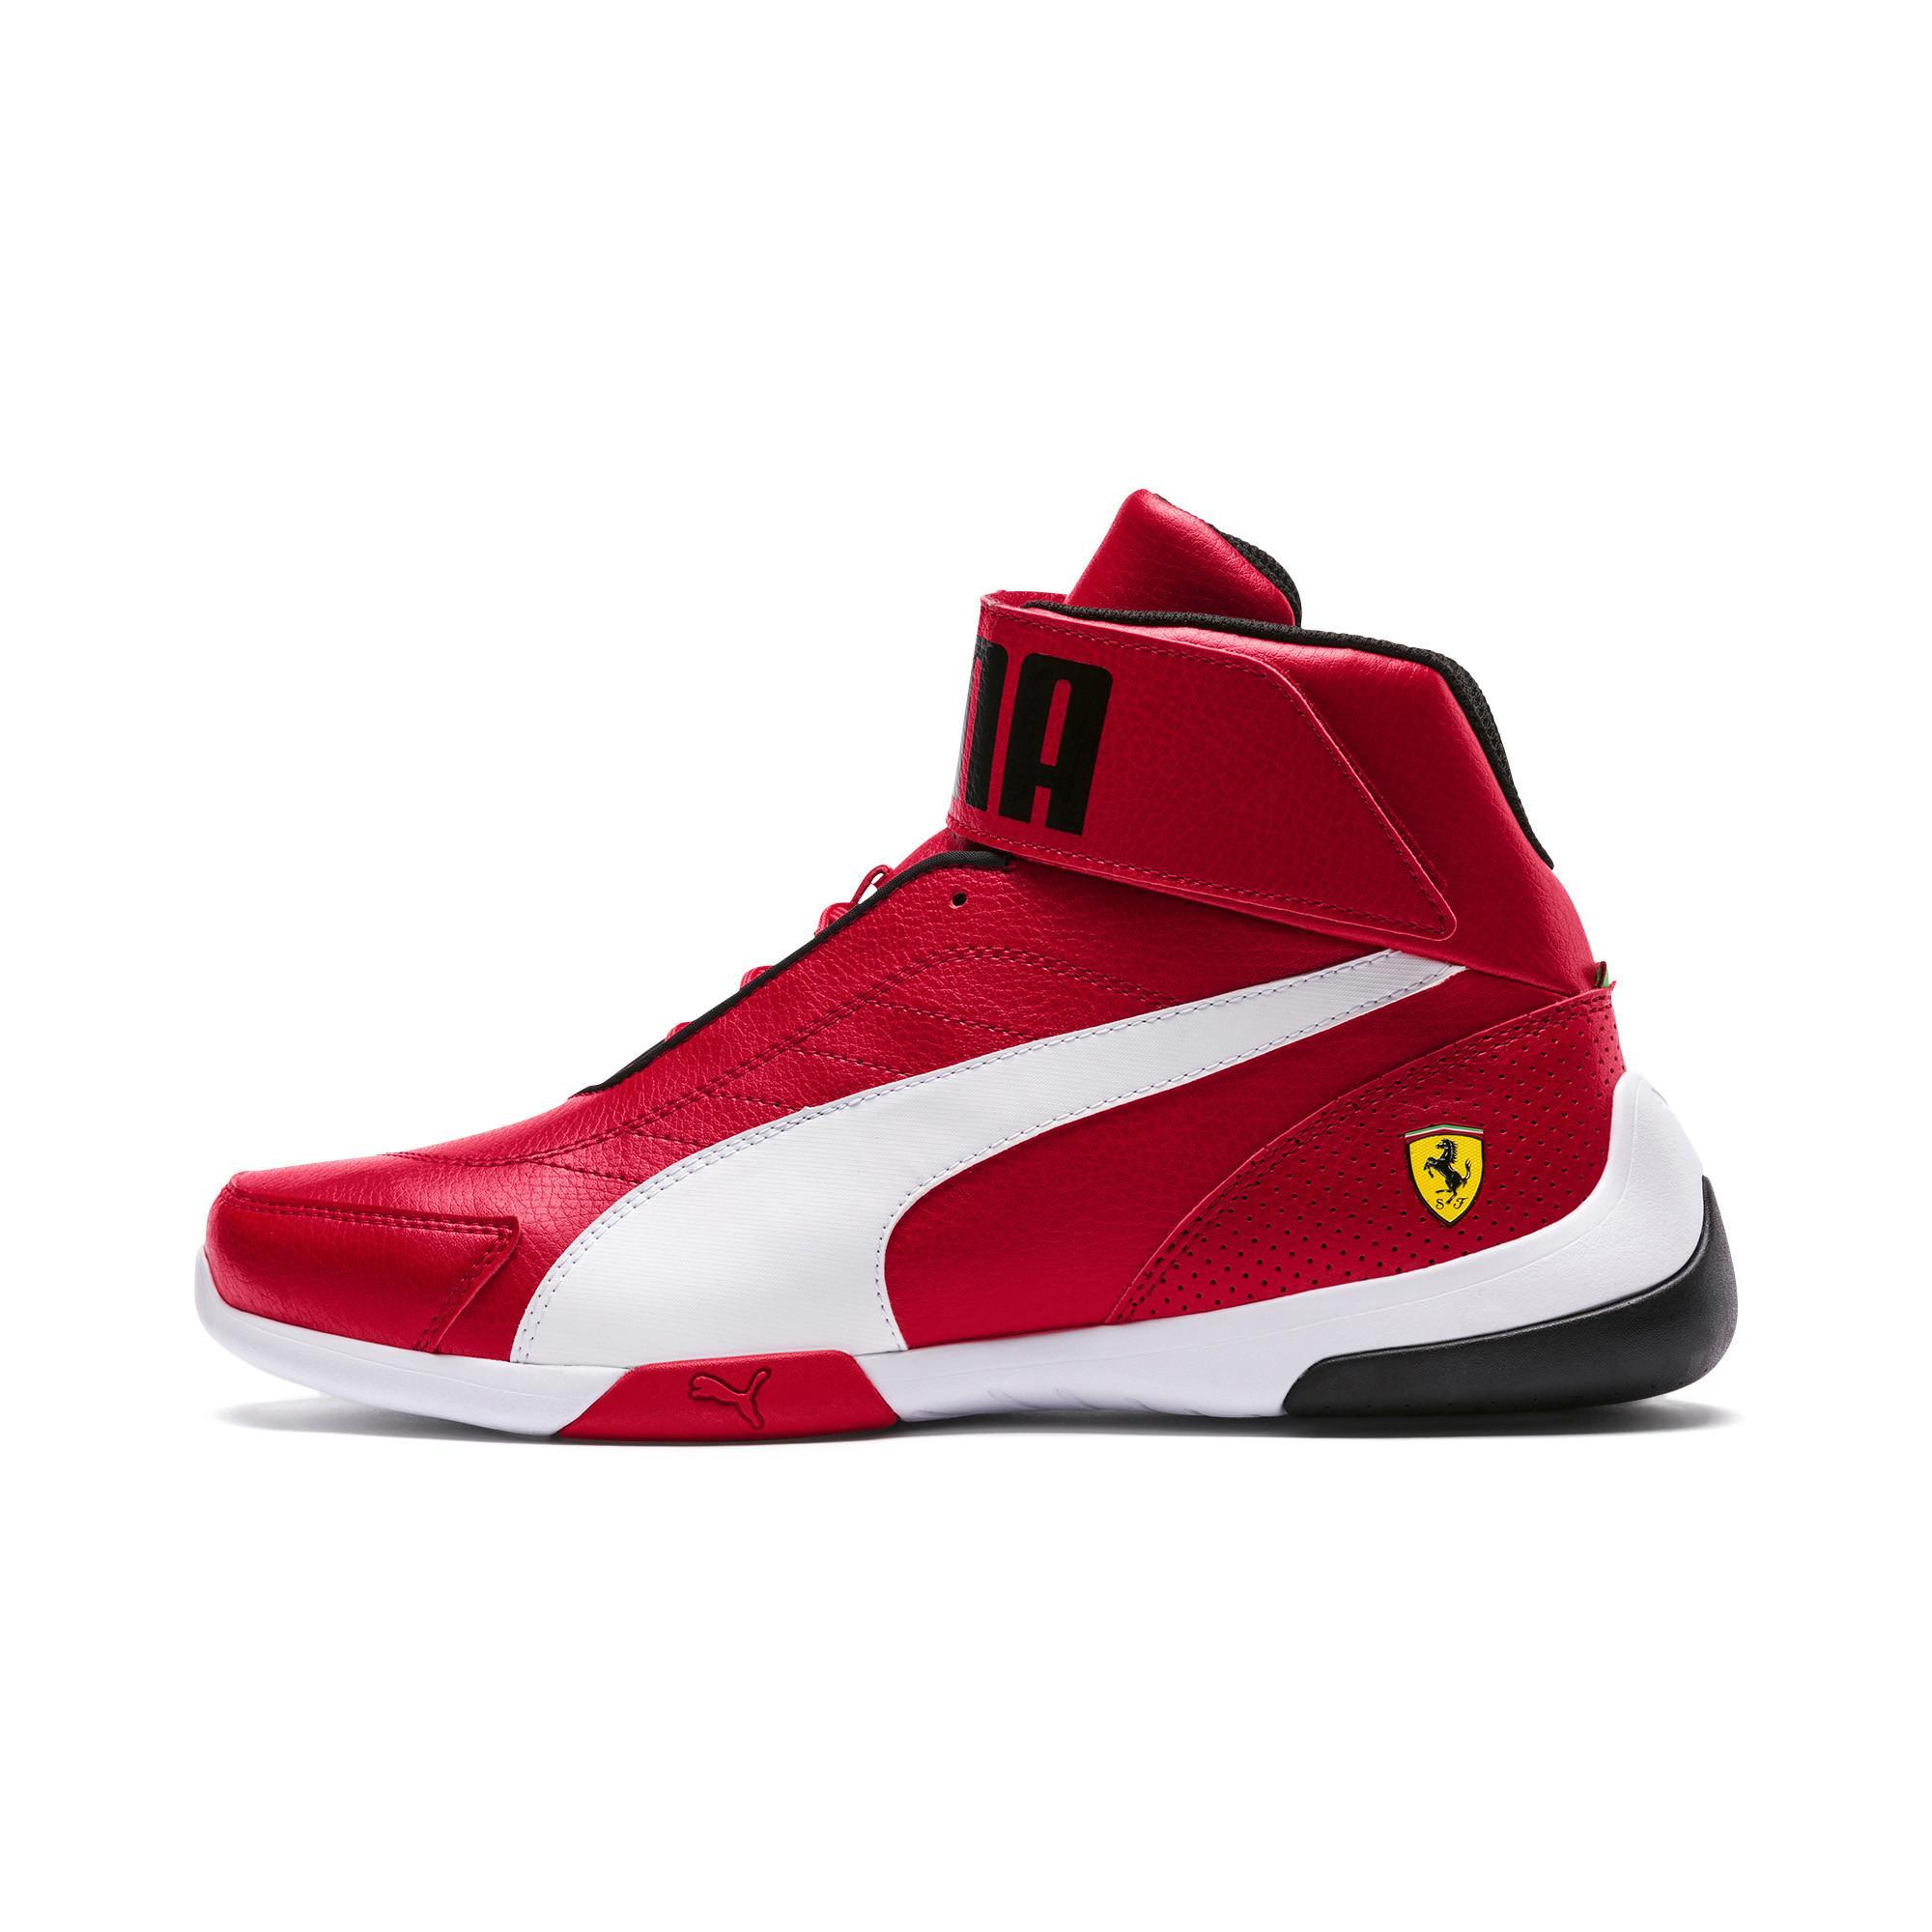 PUMA Ferrari Kart Cat Mid Iii Sneaker in 01 (Red) for Men - Lyst